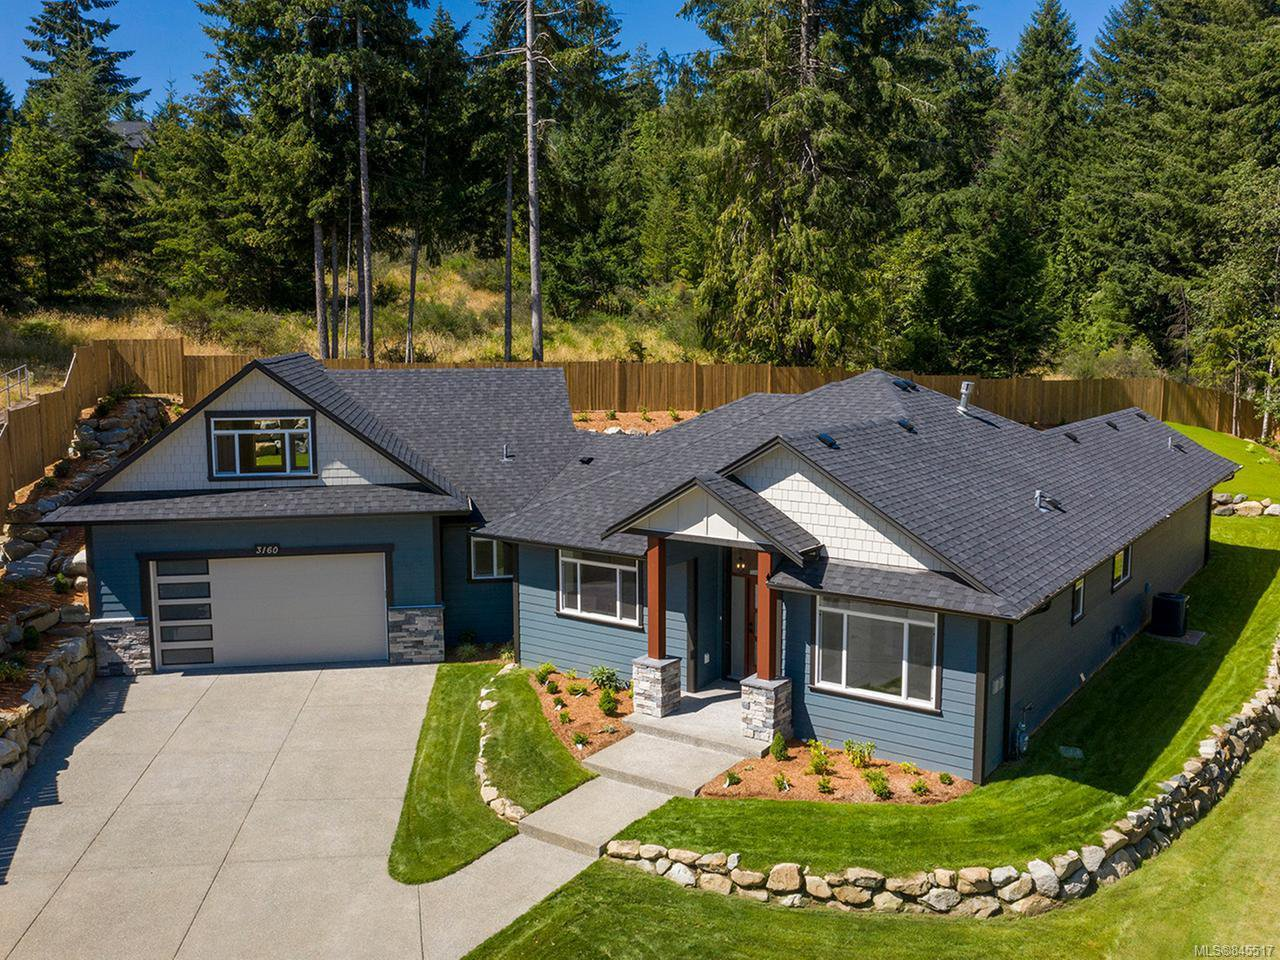 Main Photo: 3160 Klanawa Cres in COURTENAY: CV Courtenay East House for sale (Comox Valley)  : MLS®# 845517